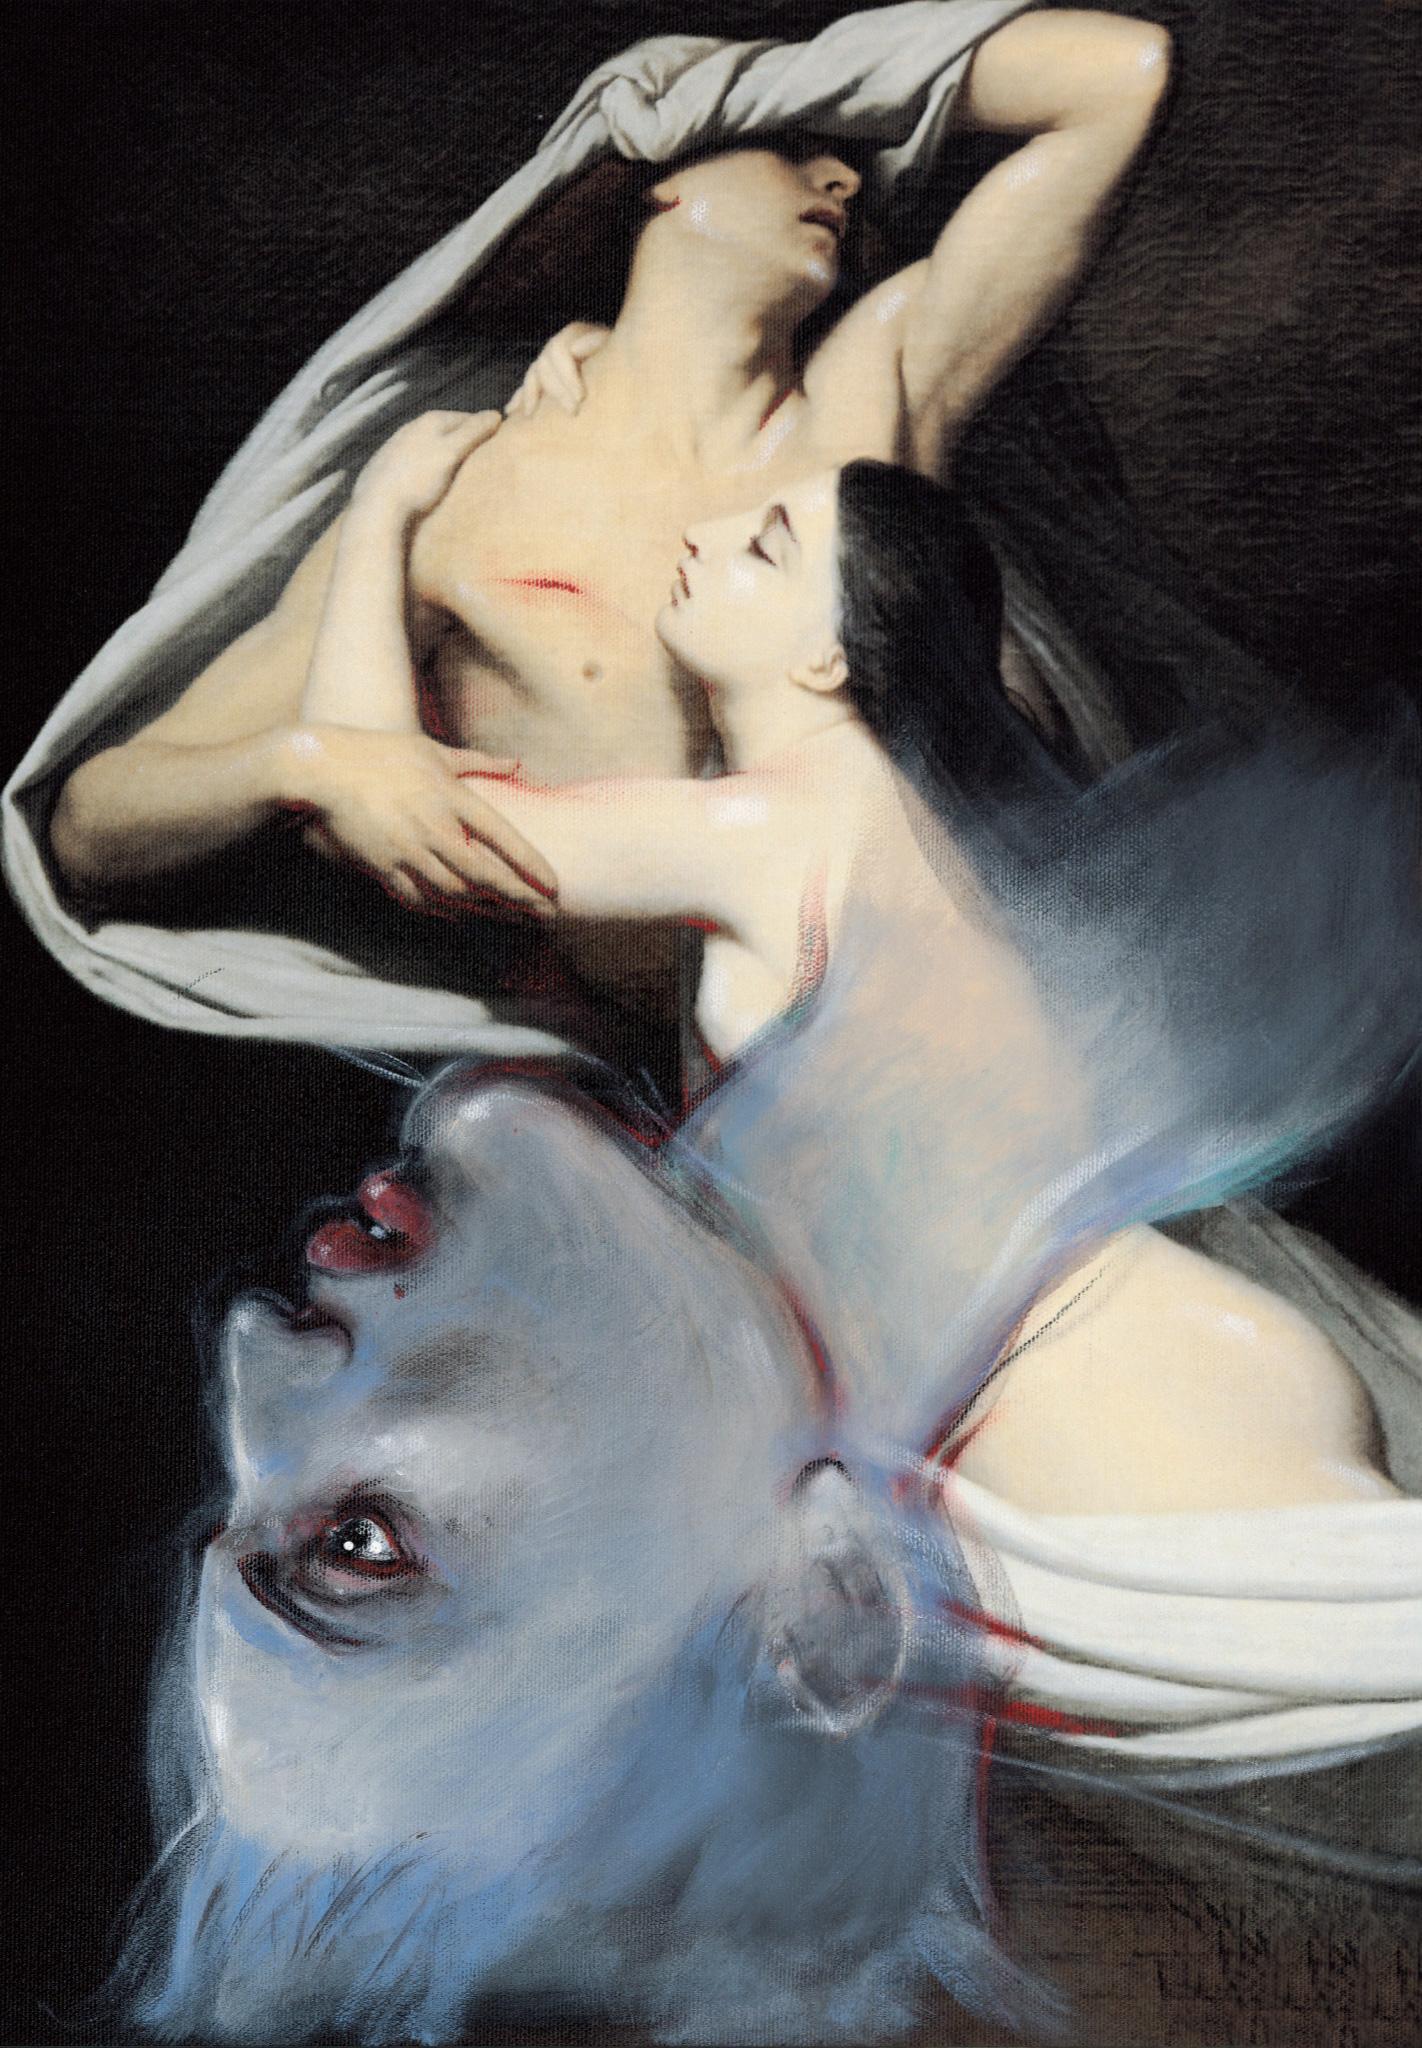 Bilal-fantomes-louvre-18.jpg